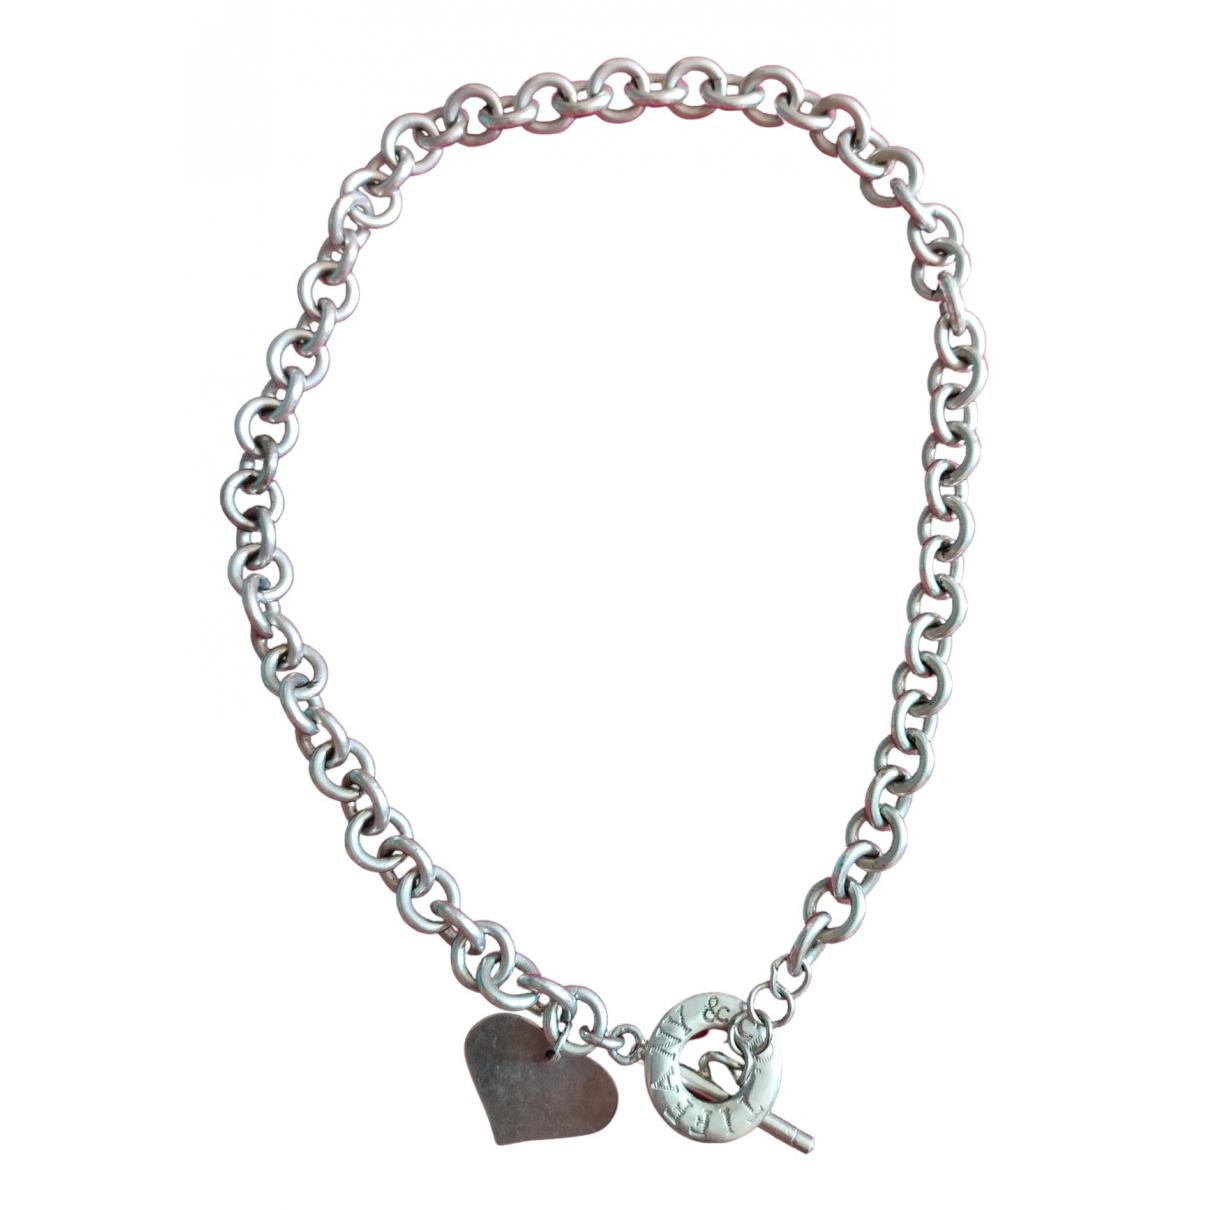 Tiffany & Co Return to Tiffany Kette in Silber